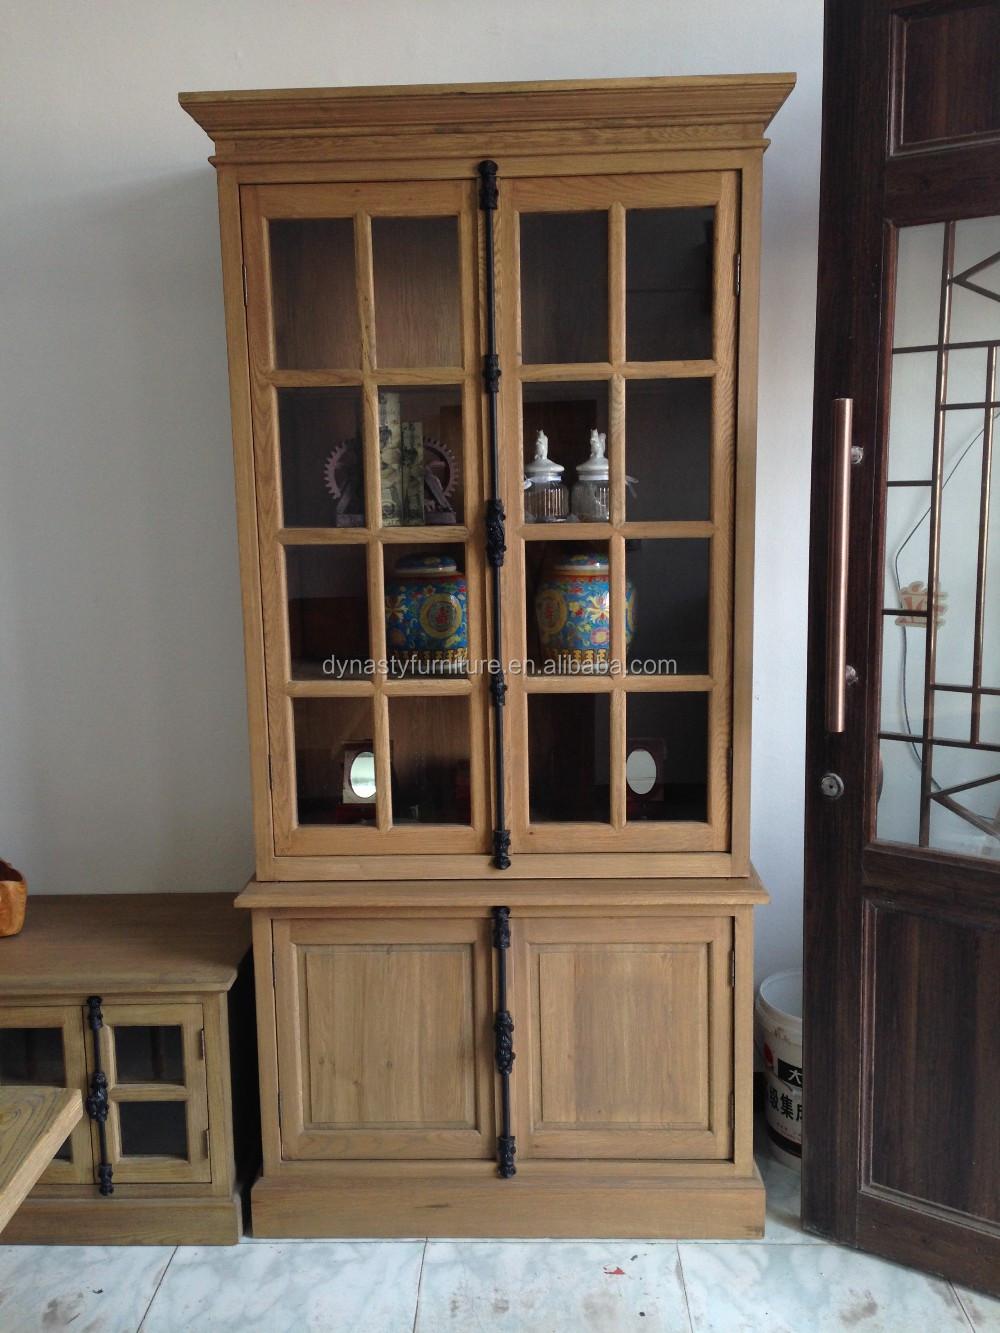 Vintaged rustieke meubels keuken meubelen teruggewonnen hout kast keukenmeubelen product id - Keukenmeubelen rustiek ...